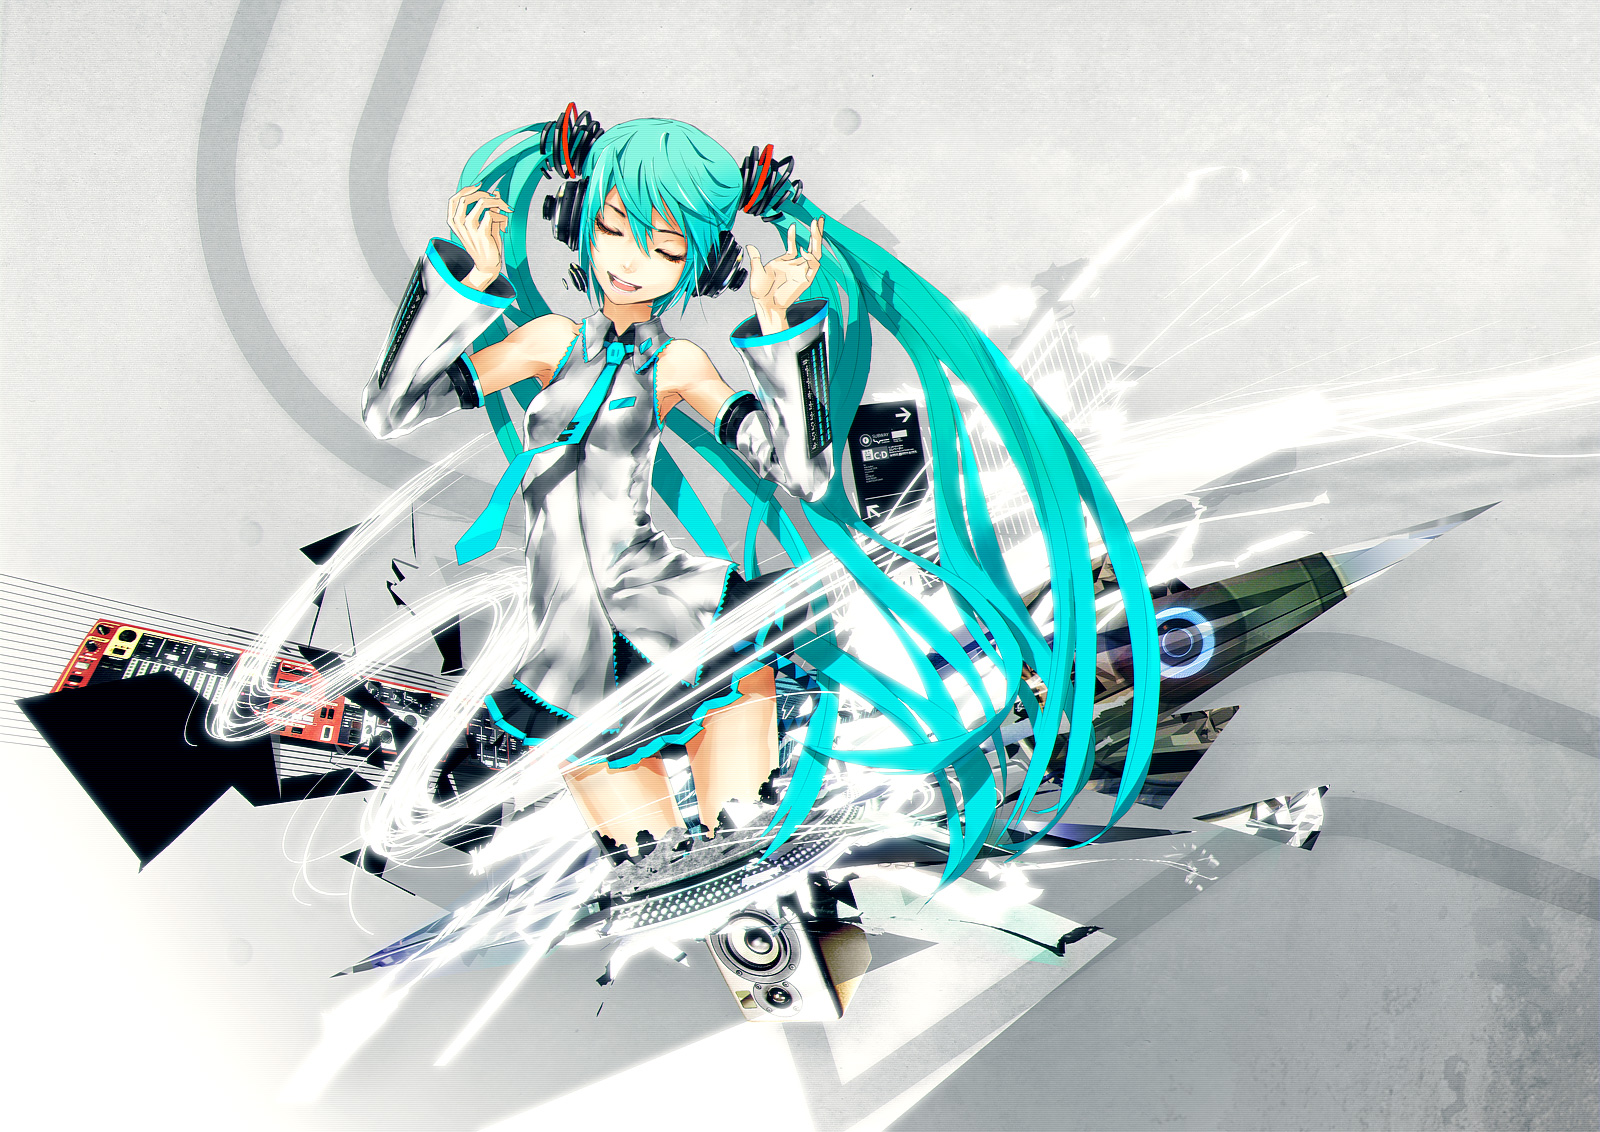 Anime DJ Google Skins Cute Anime DJ Google Backgrounds Cute Anime 1600x1132